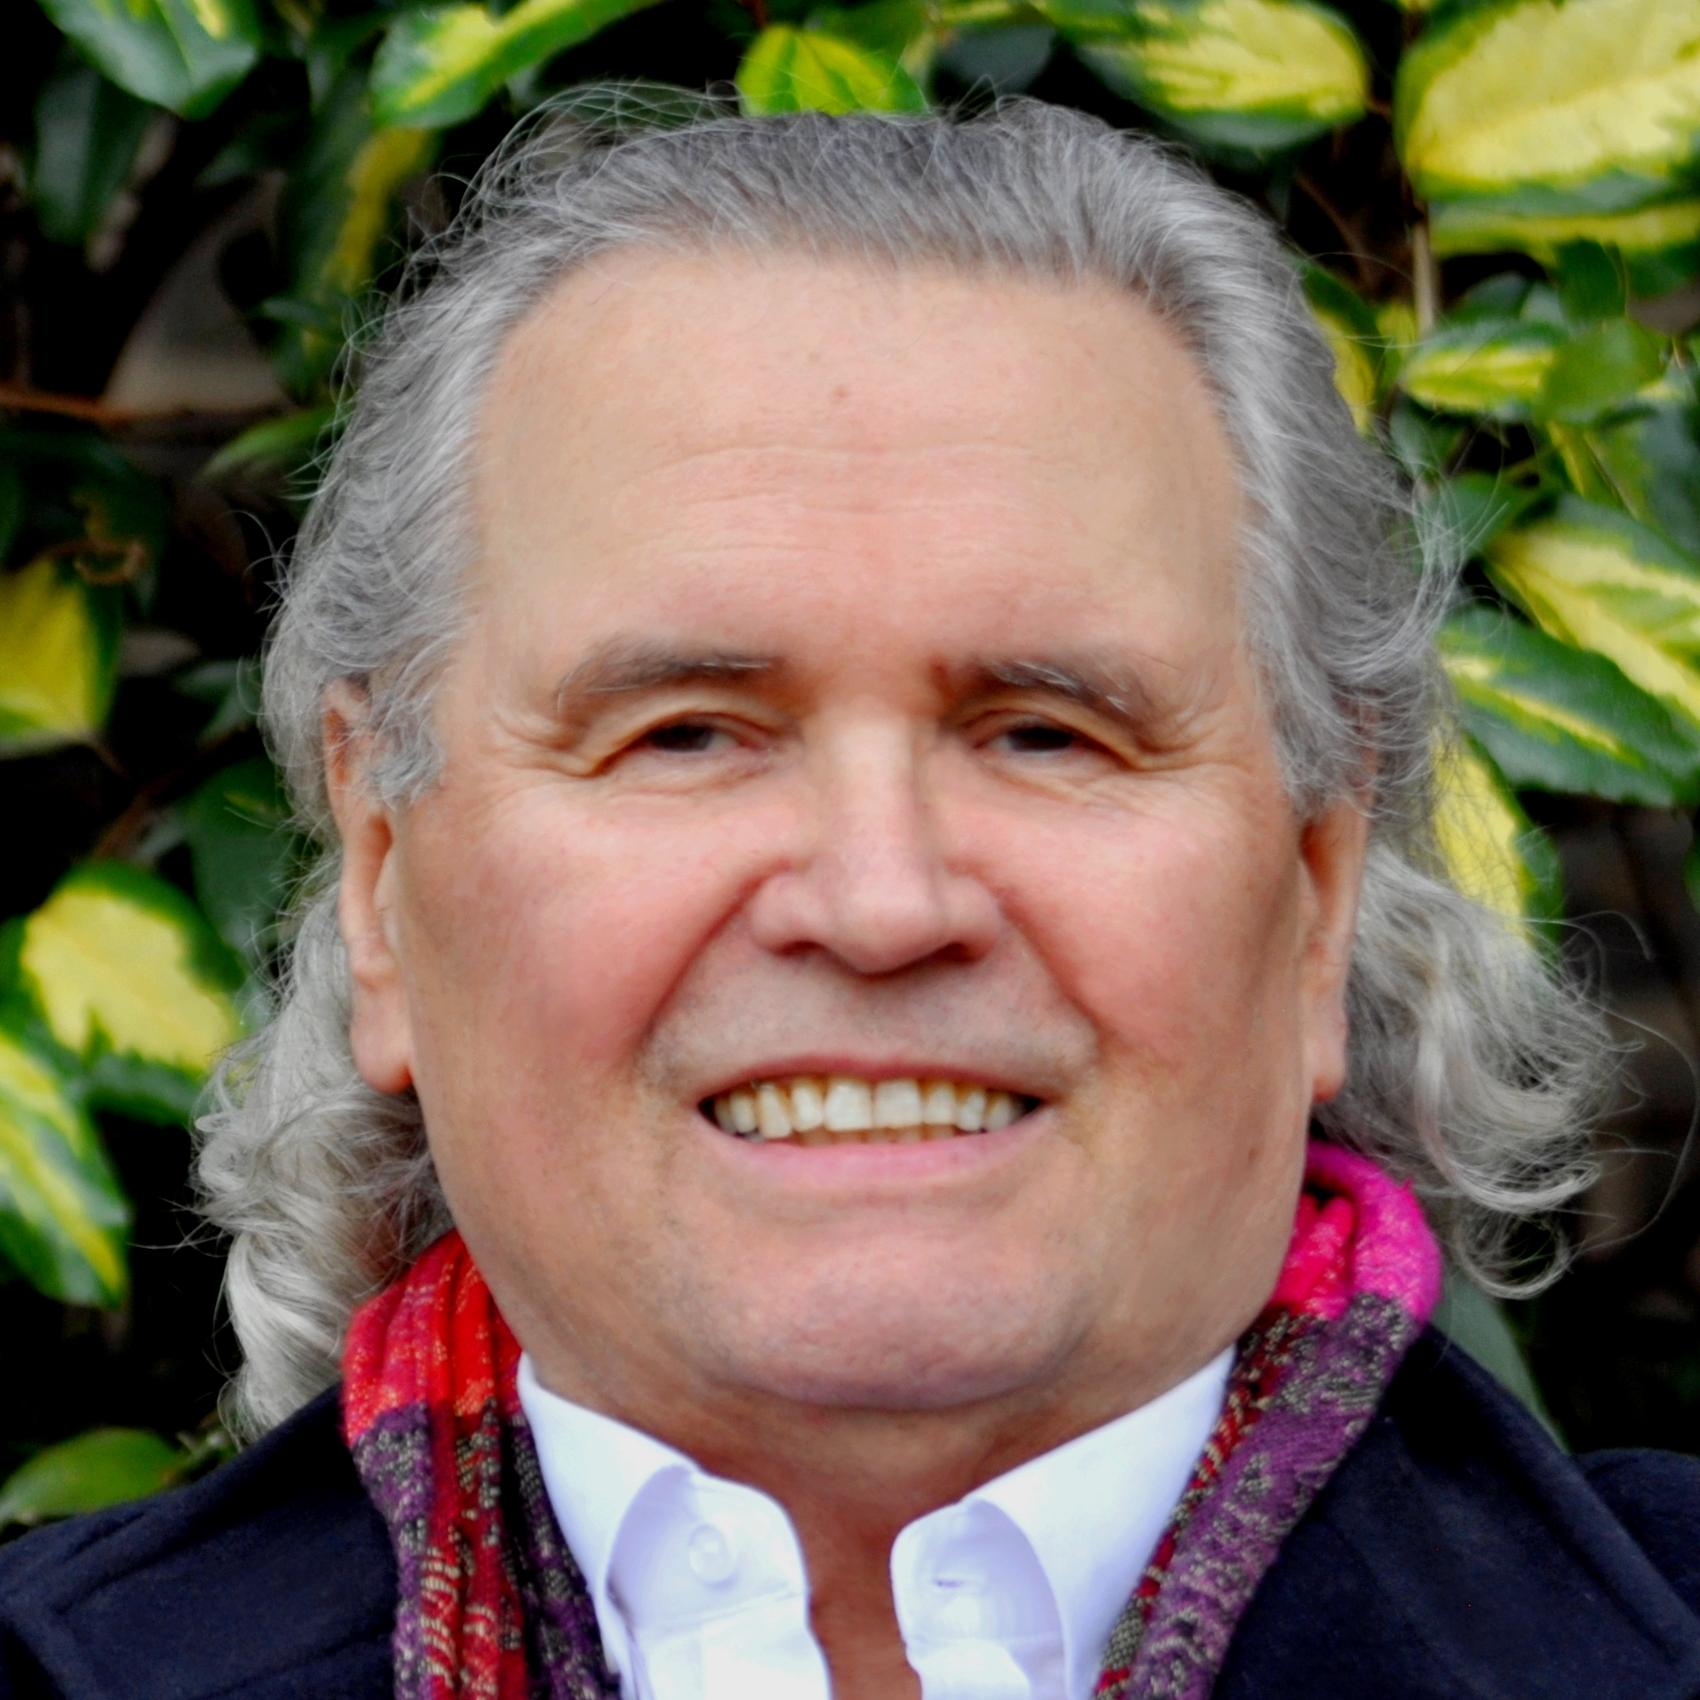 Heinz Andreas Schumi